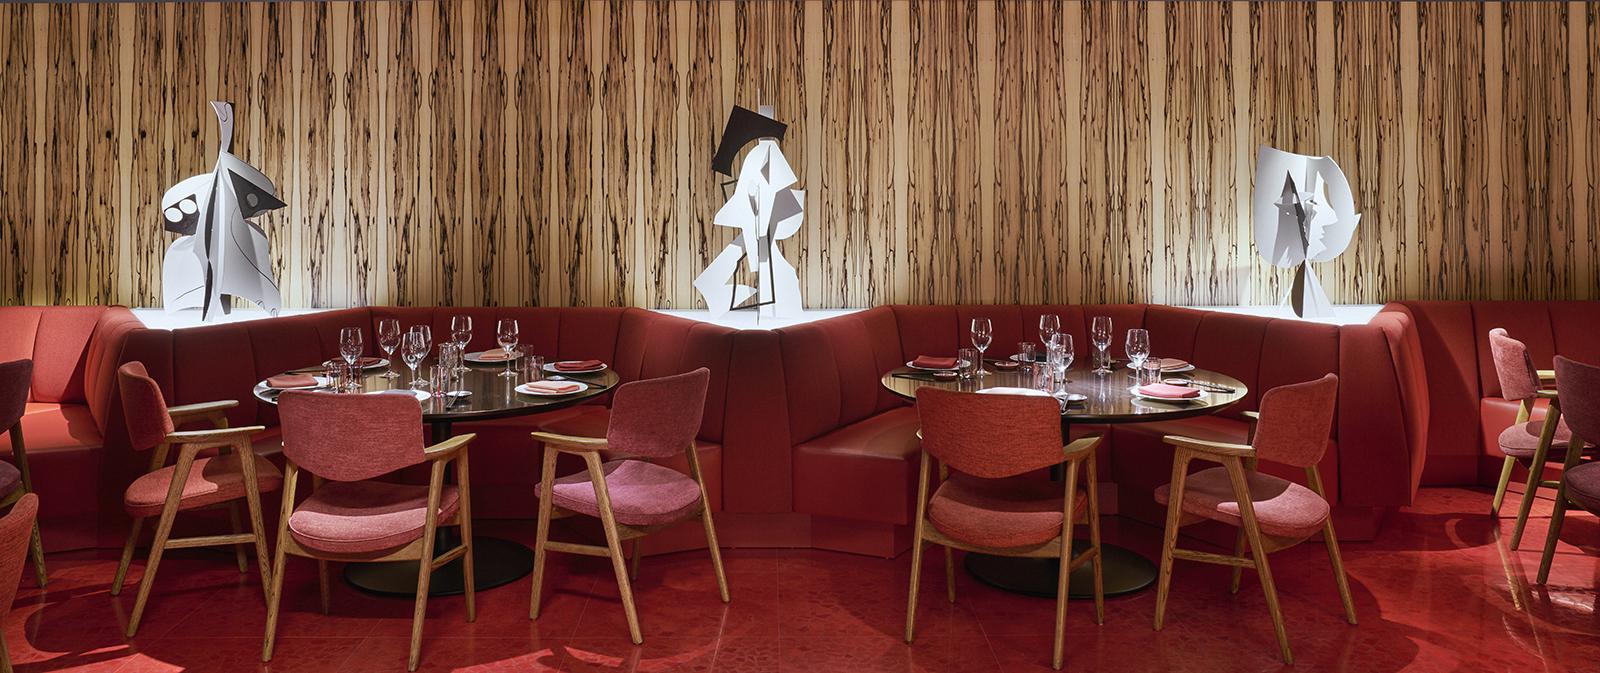 Interior Design Inspiration from the World's Most Beautiful Restaurants -  Christie's International Real Estate